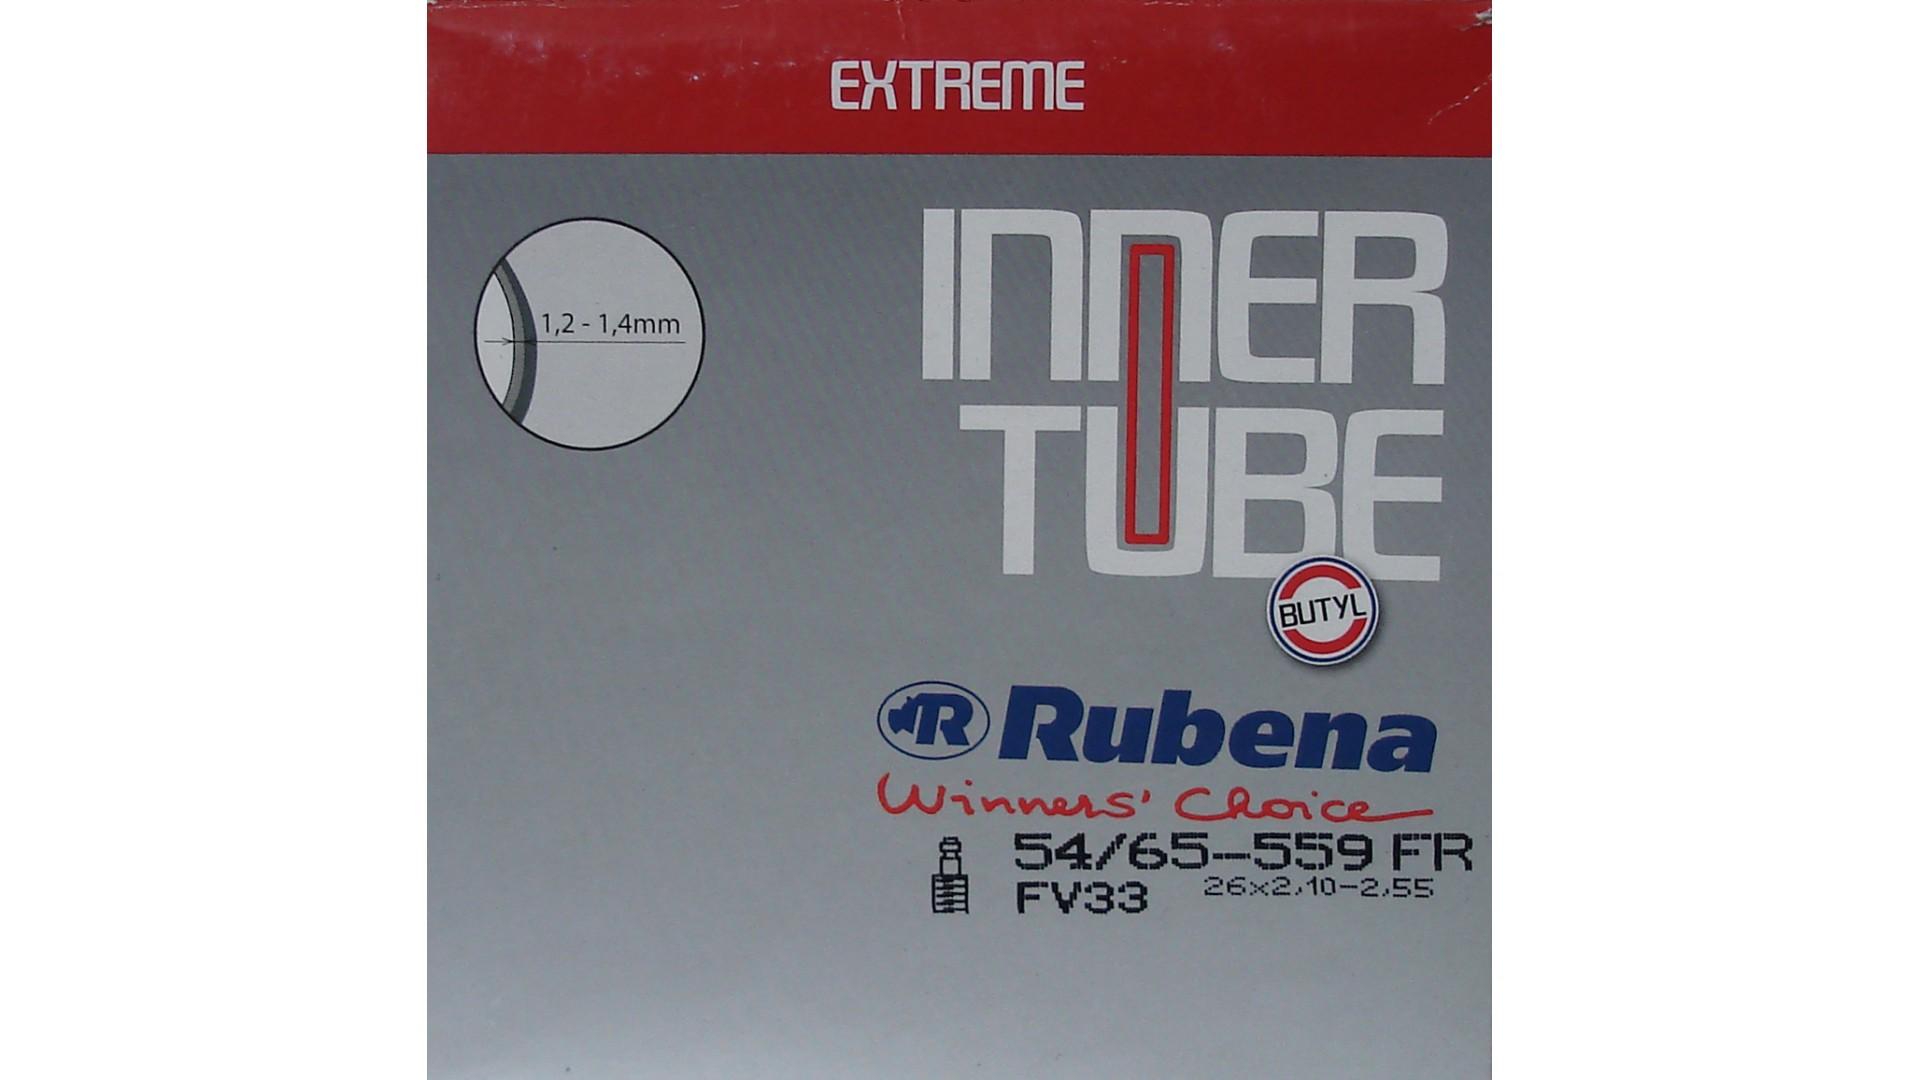 Камера RUBENA 26 x 2,10 - 2,55 FV33 Freeride D10FR